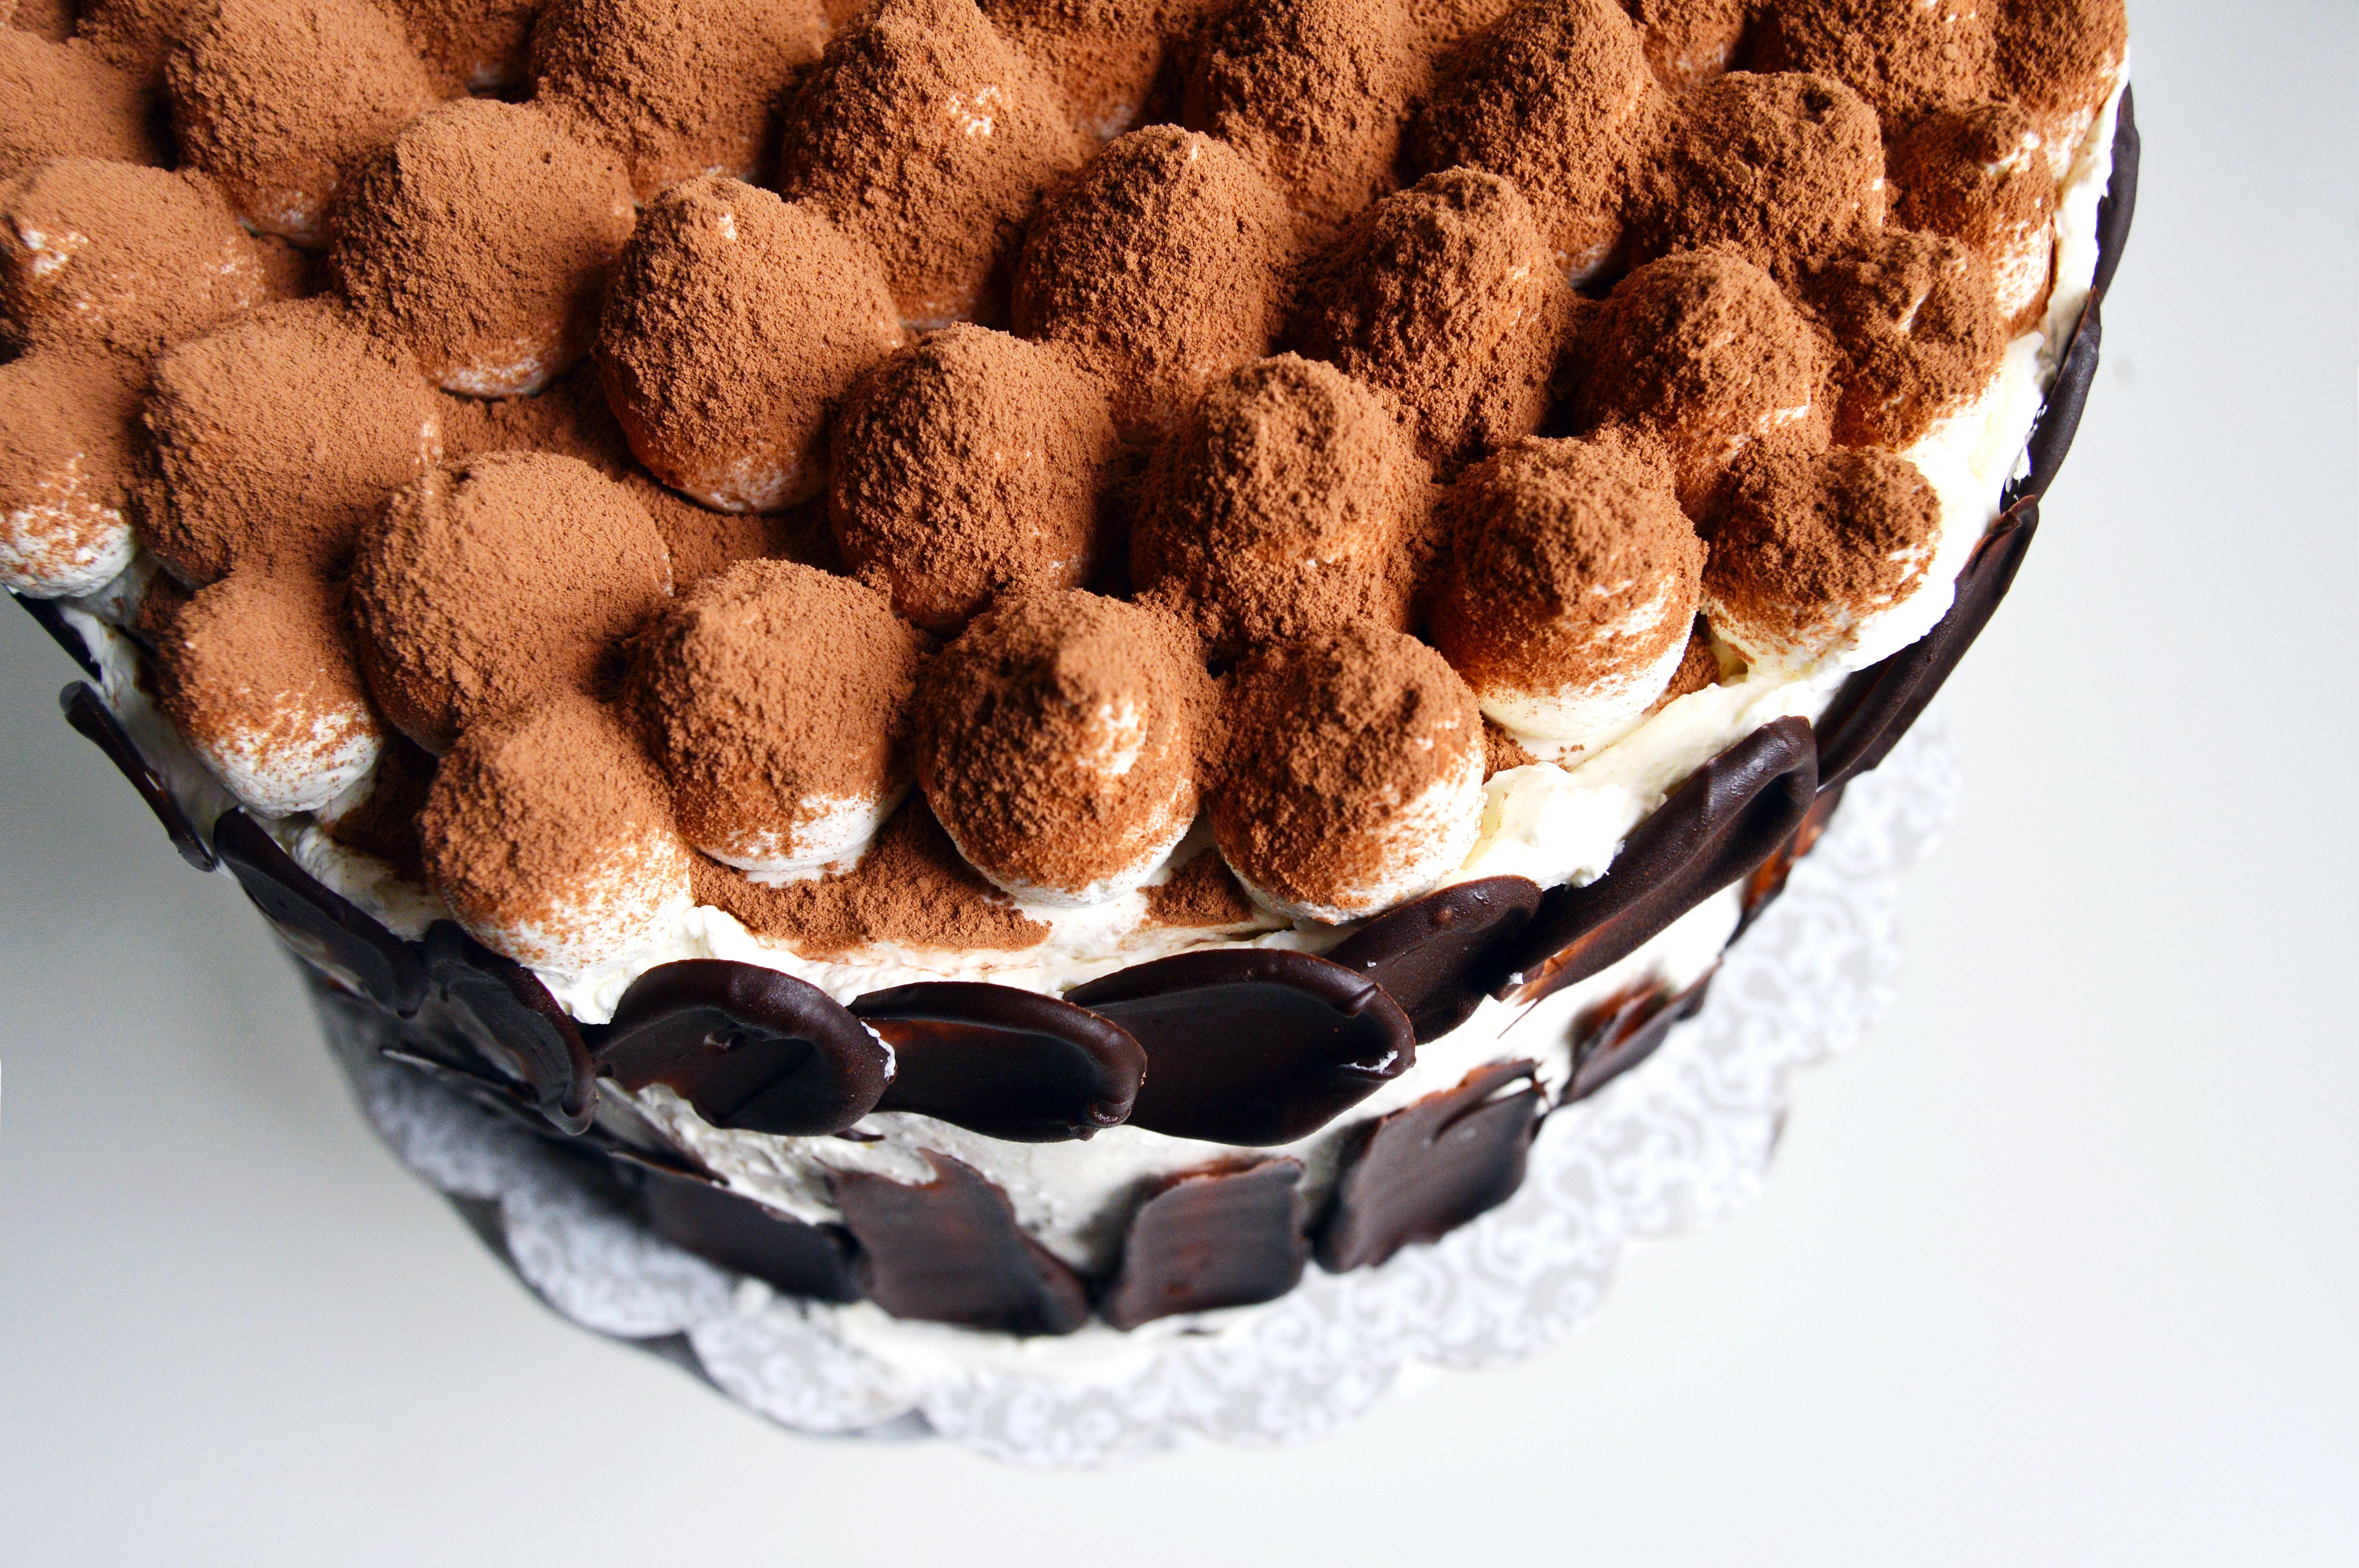 Tiramisu Crunch Ice Cream Cake The Busy Spatula